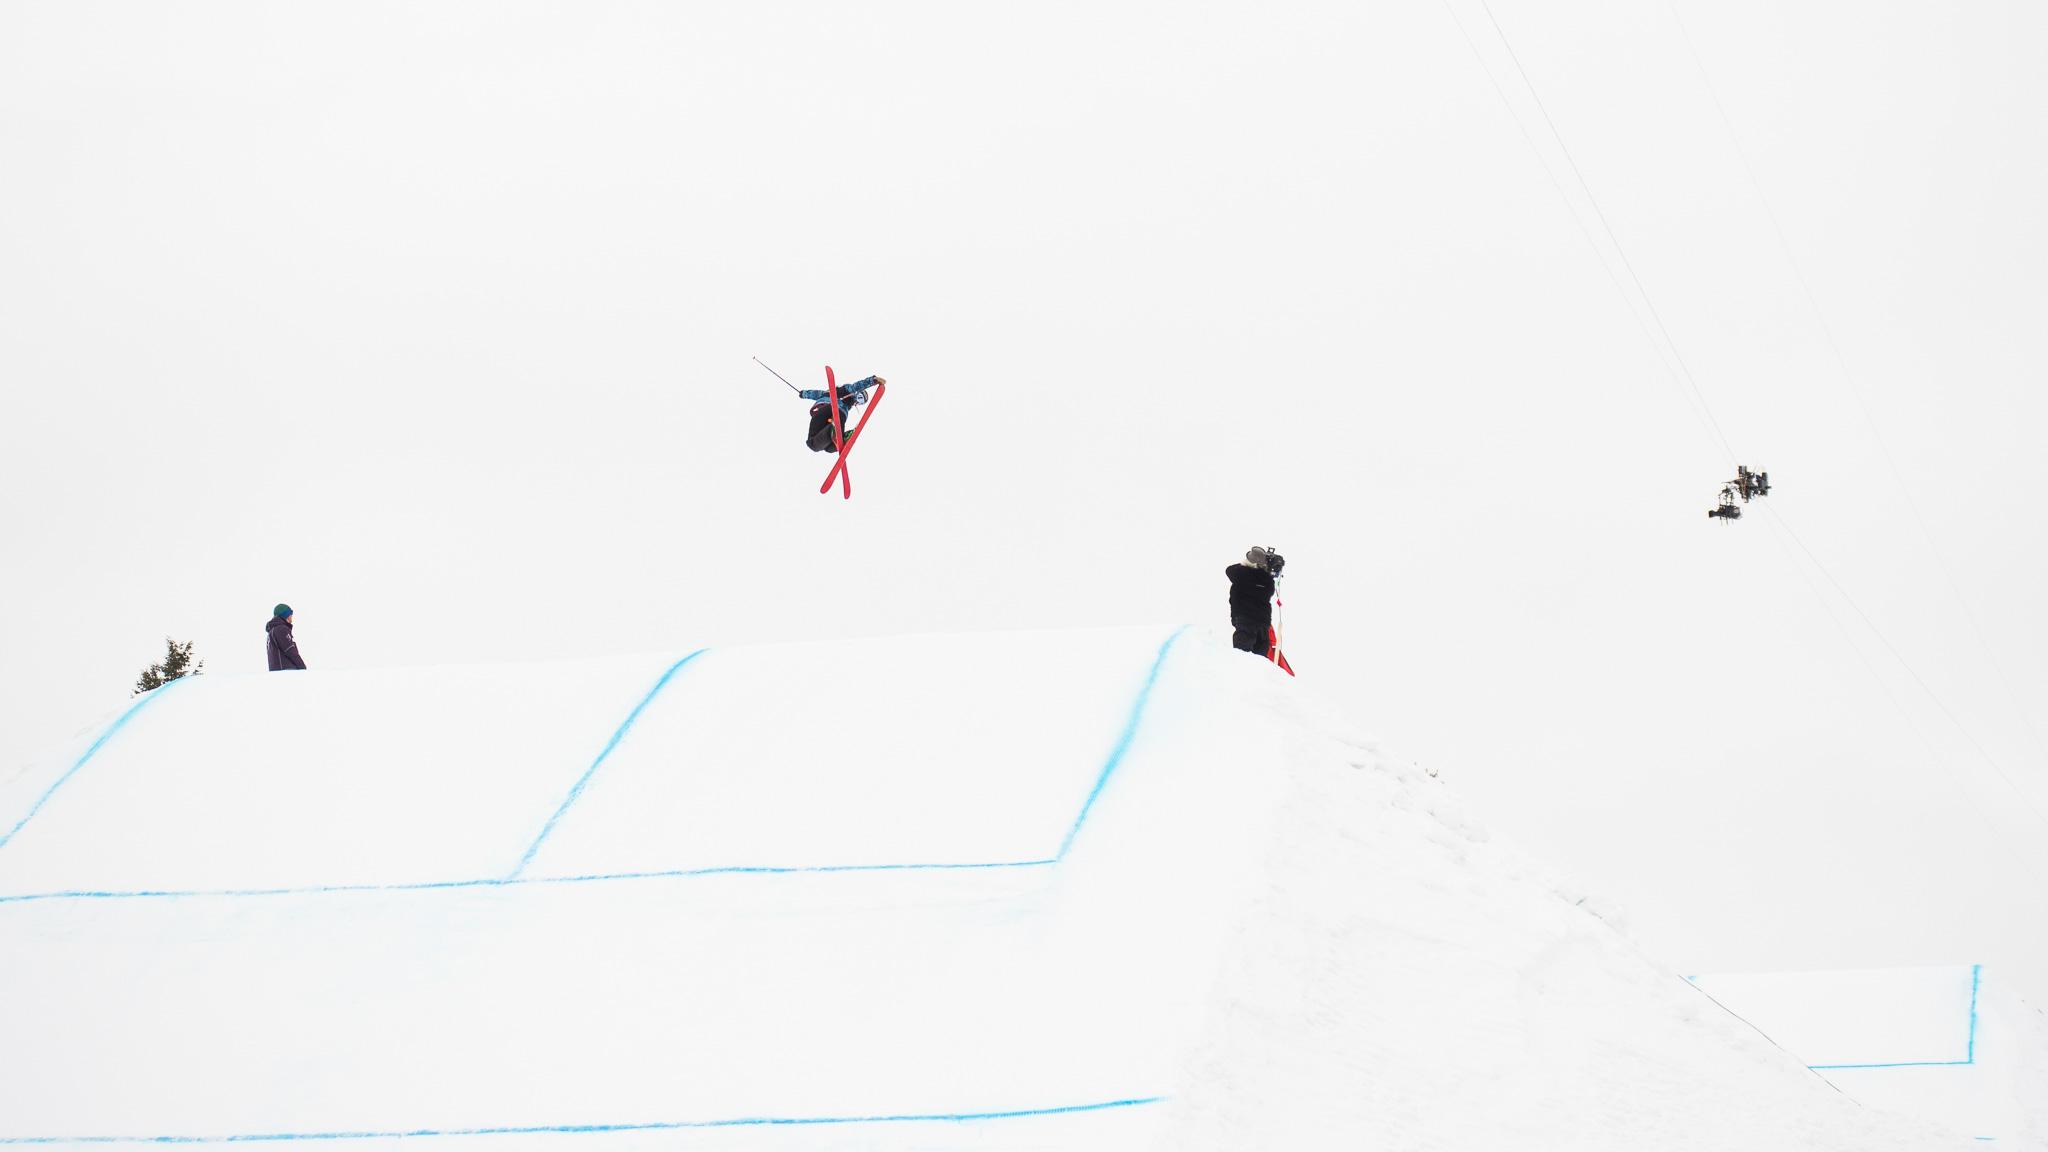 W Ski Slopestyle: Devin Logan